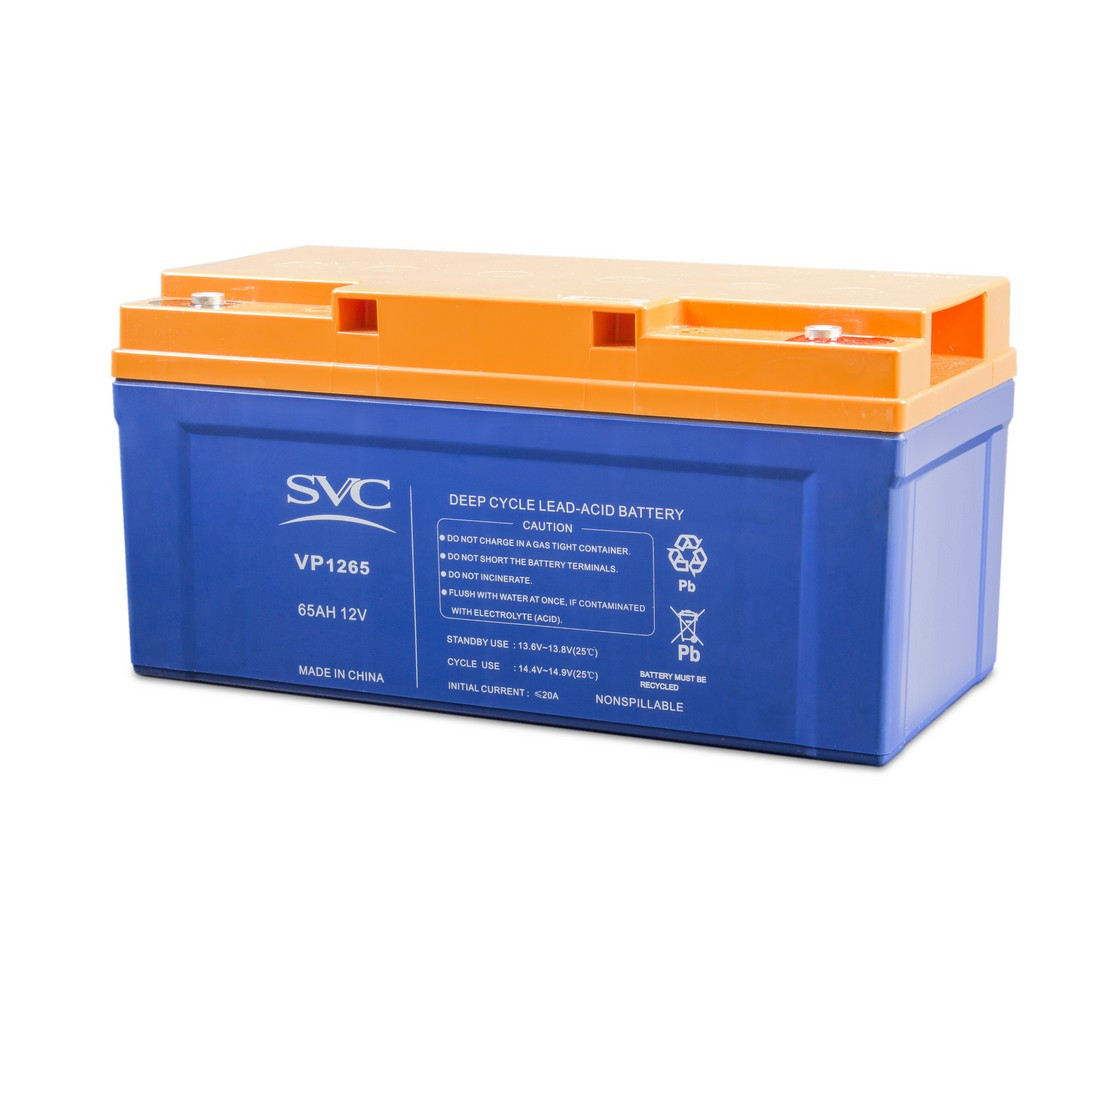 Батарея, SVC, 12В 65 Ач, Размер в мм.: 179*167*350